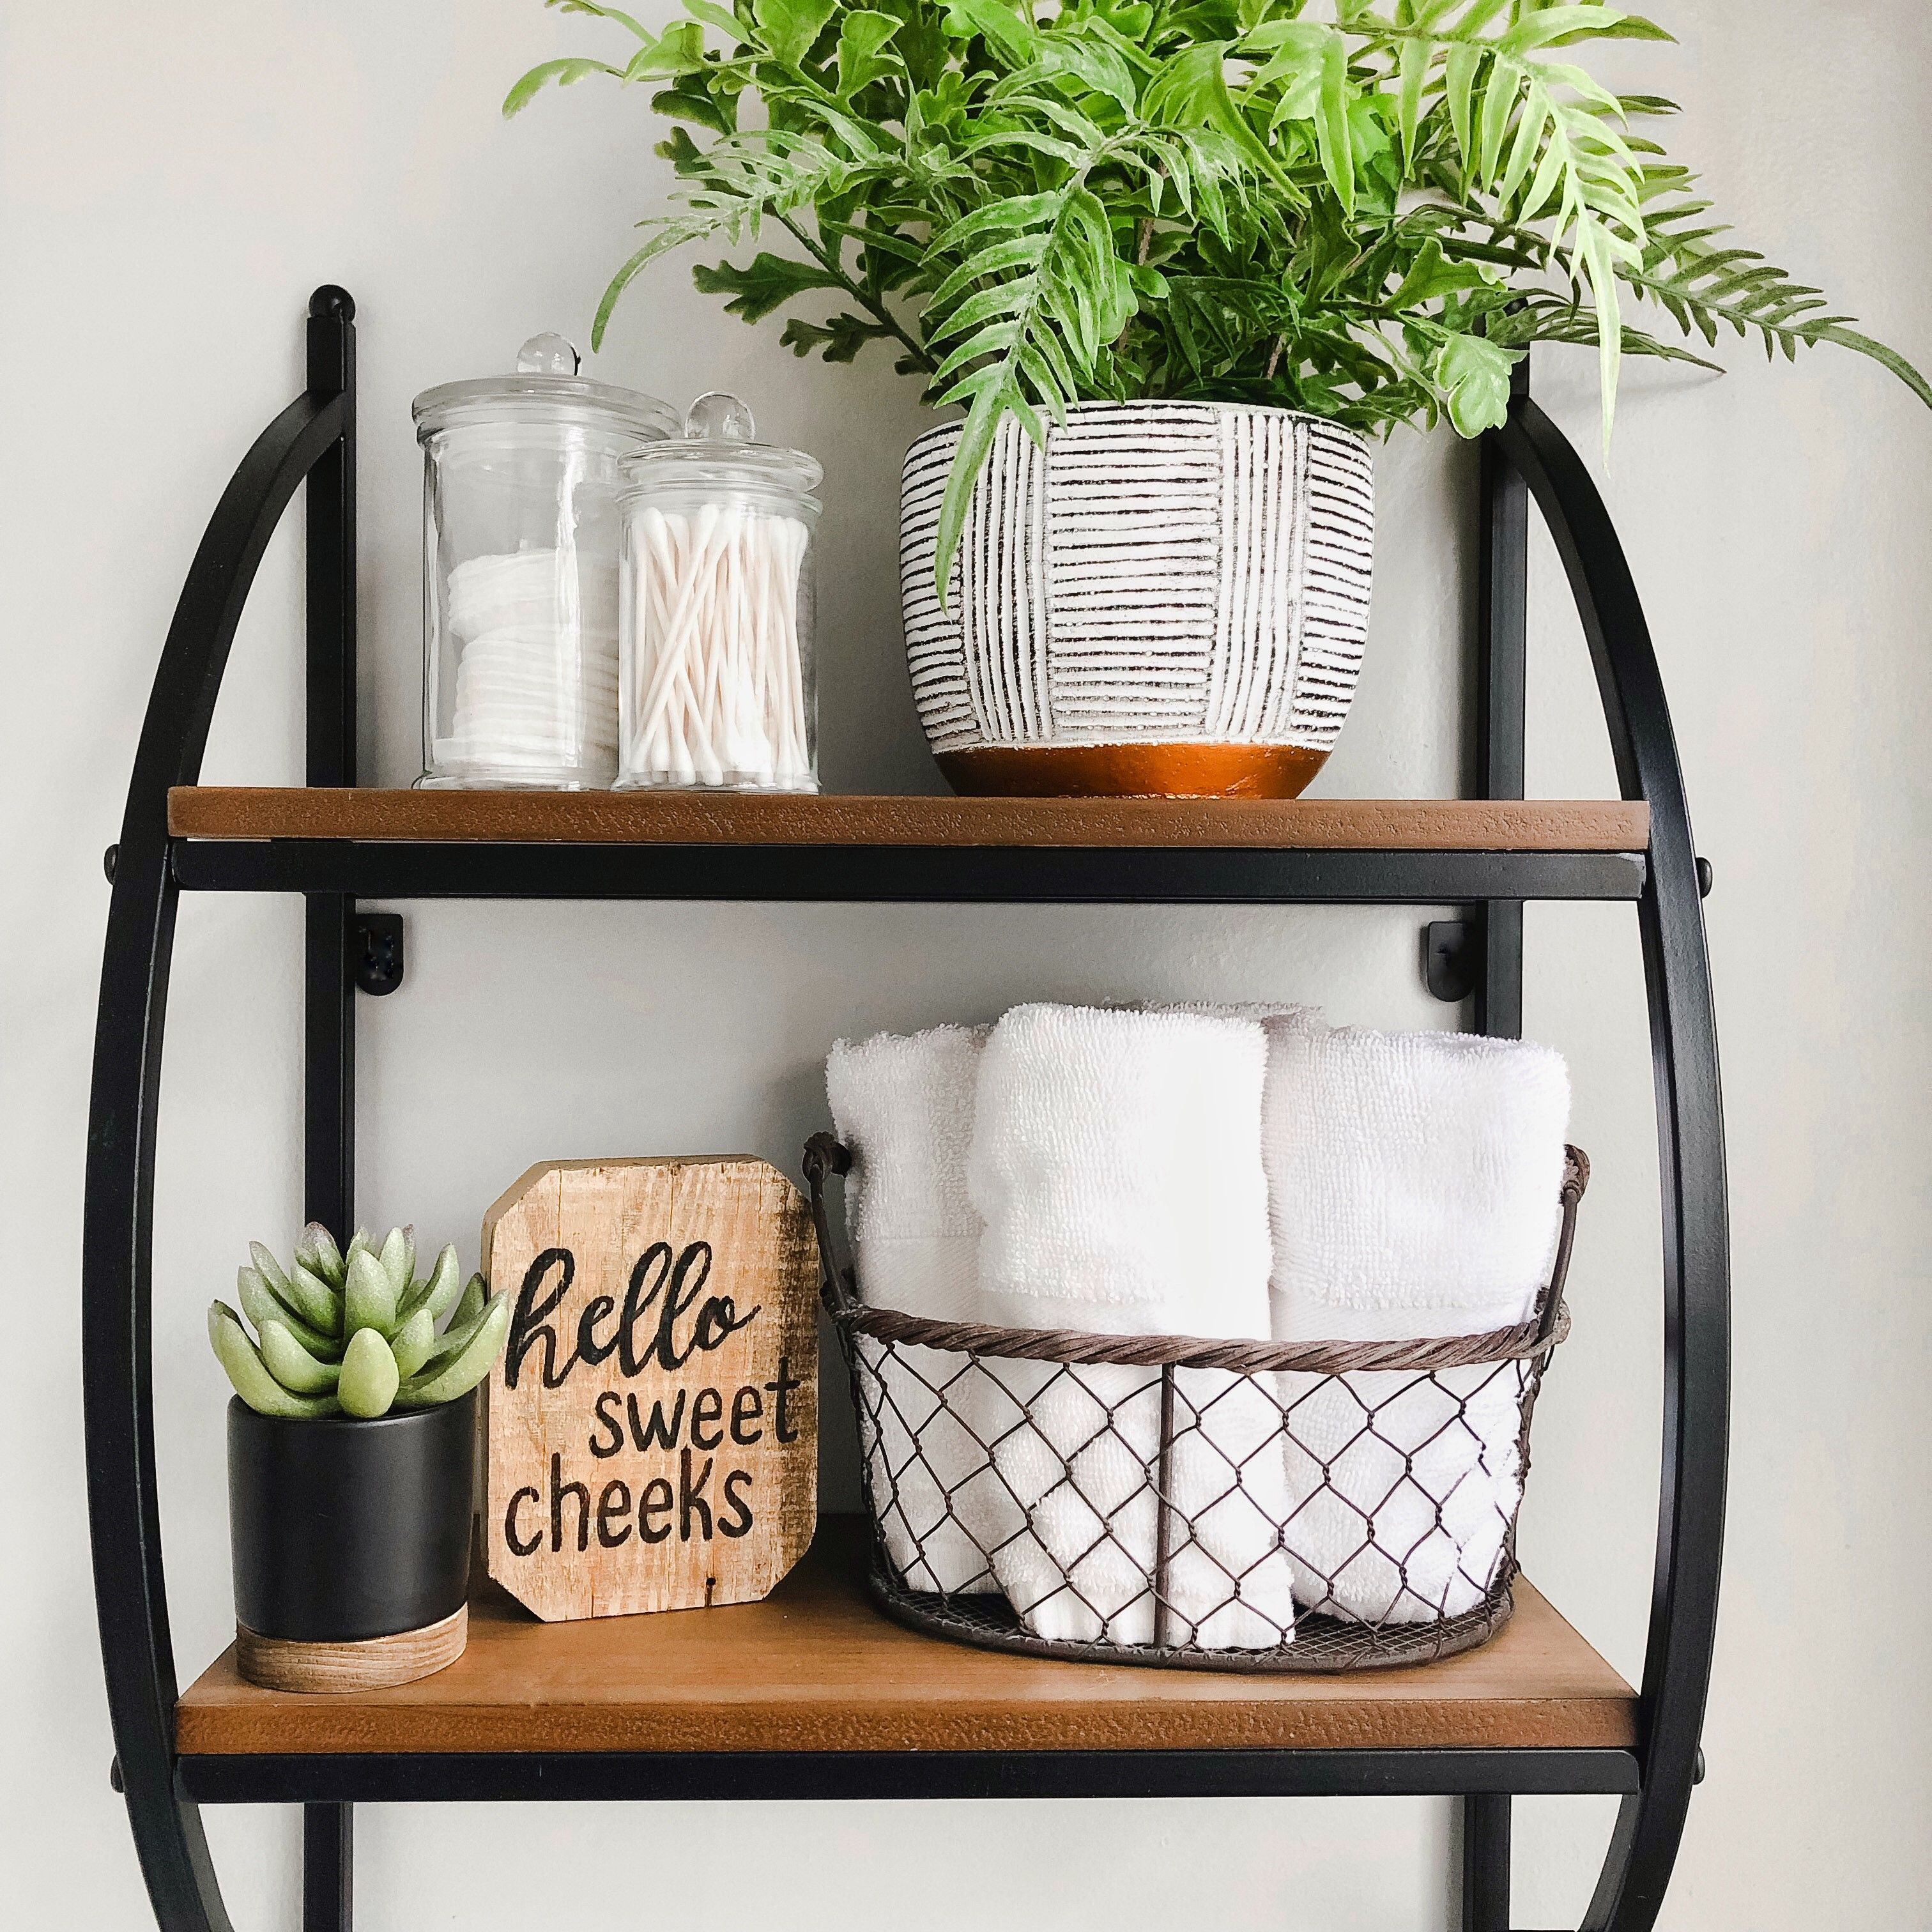 Bathroom organizaton for days with White Oak Shop! This shelf is